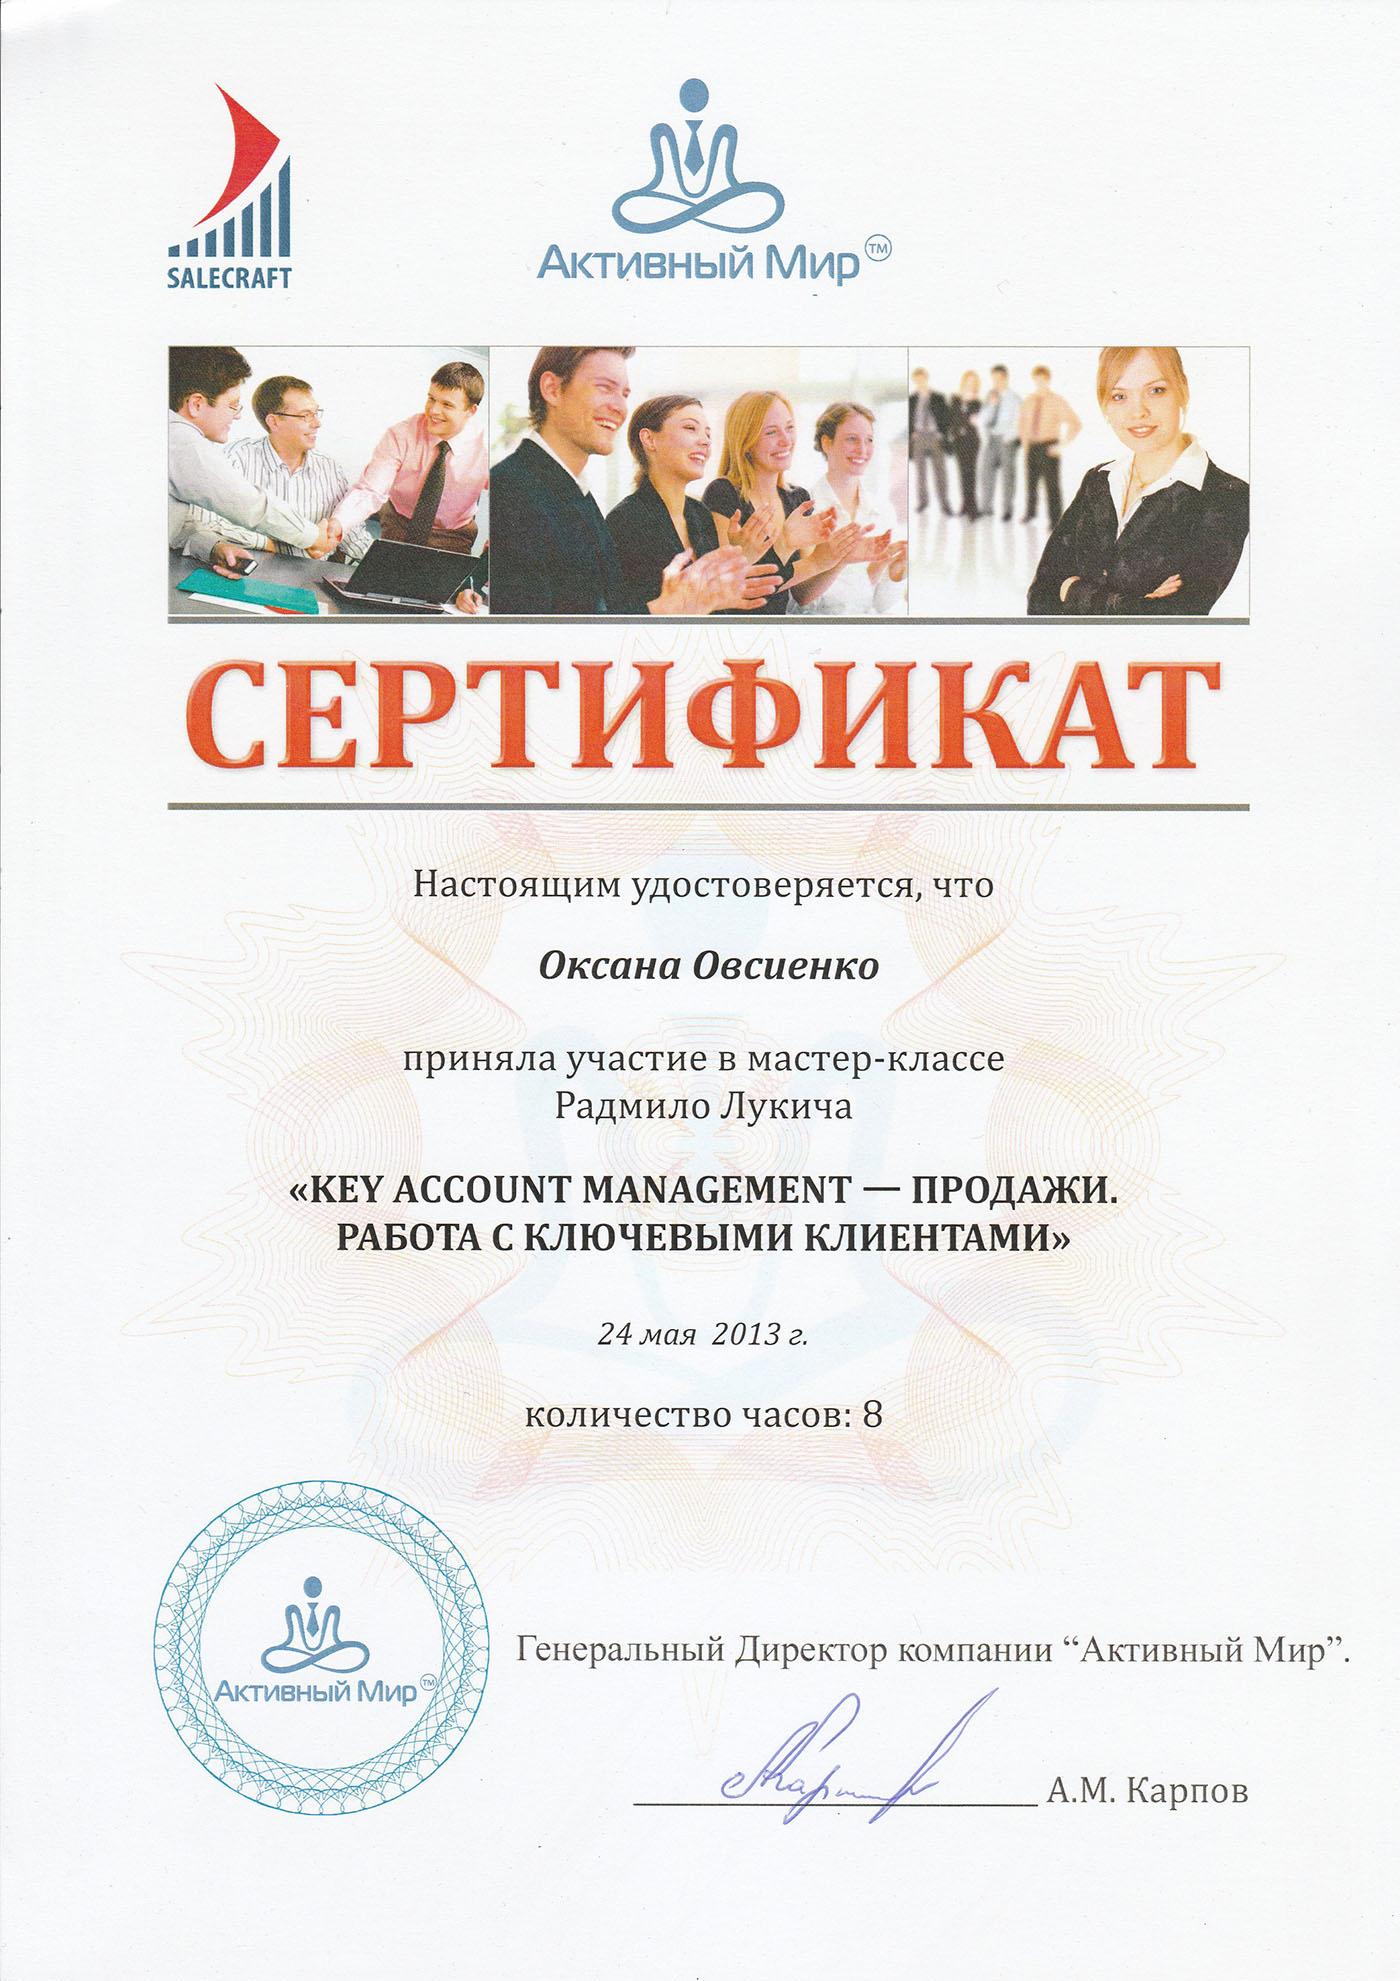 Оксана Овсиенко - Сертификат - Key account management - продажи - Работа с ключевыми клиентами